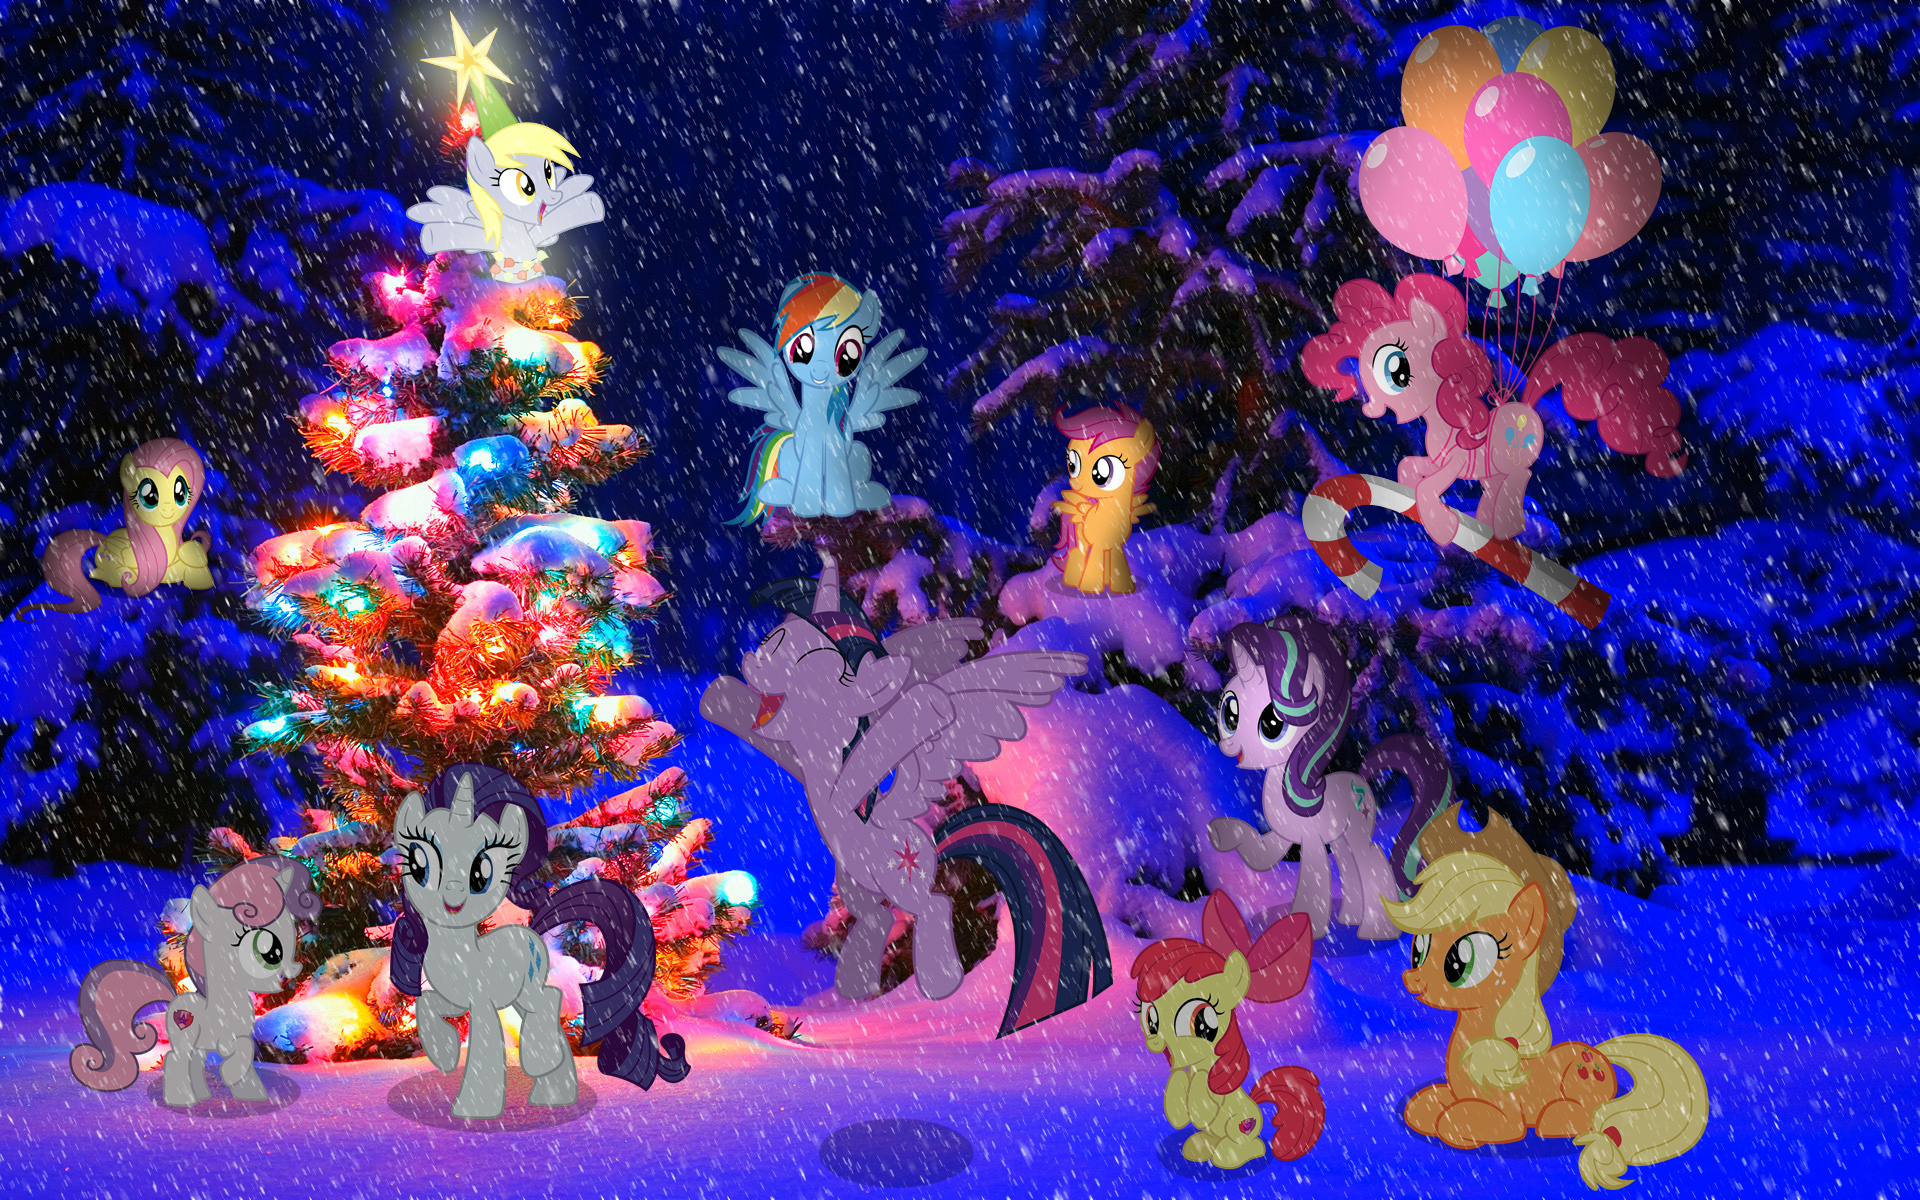 Hd Christmas Wallpapers Desktop Backgrounds Merry Christmas 1920x1200